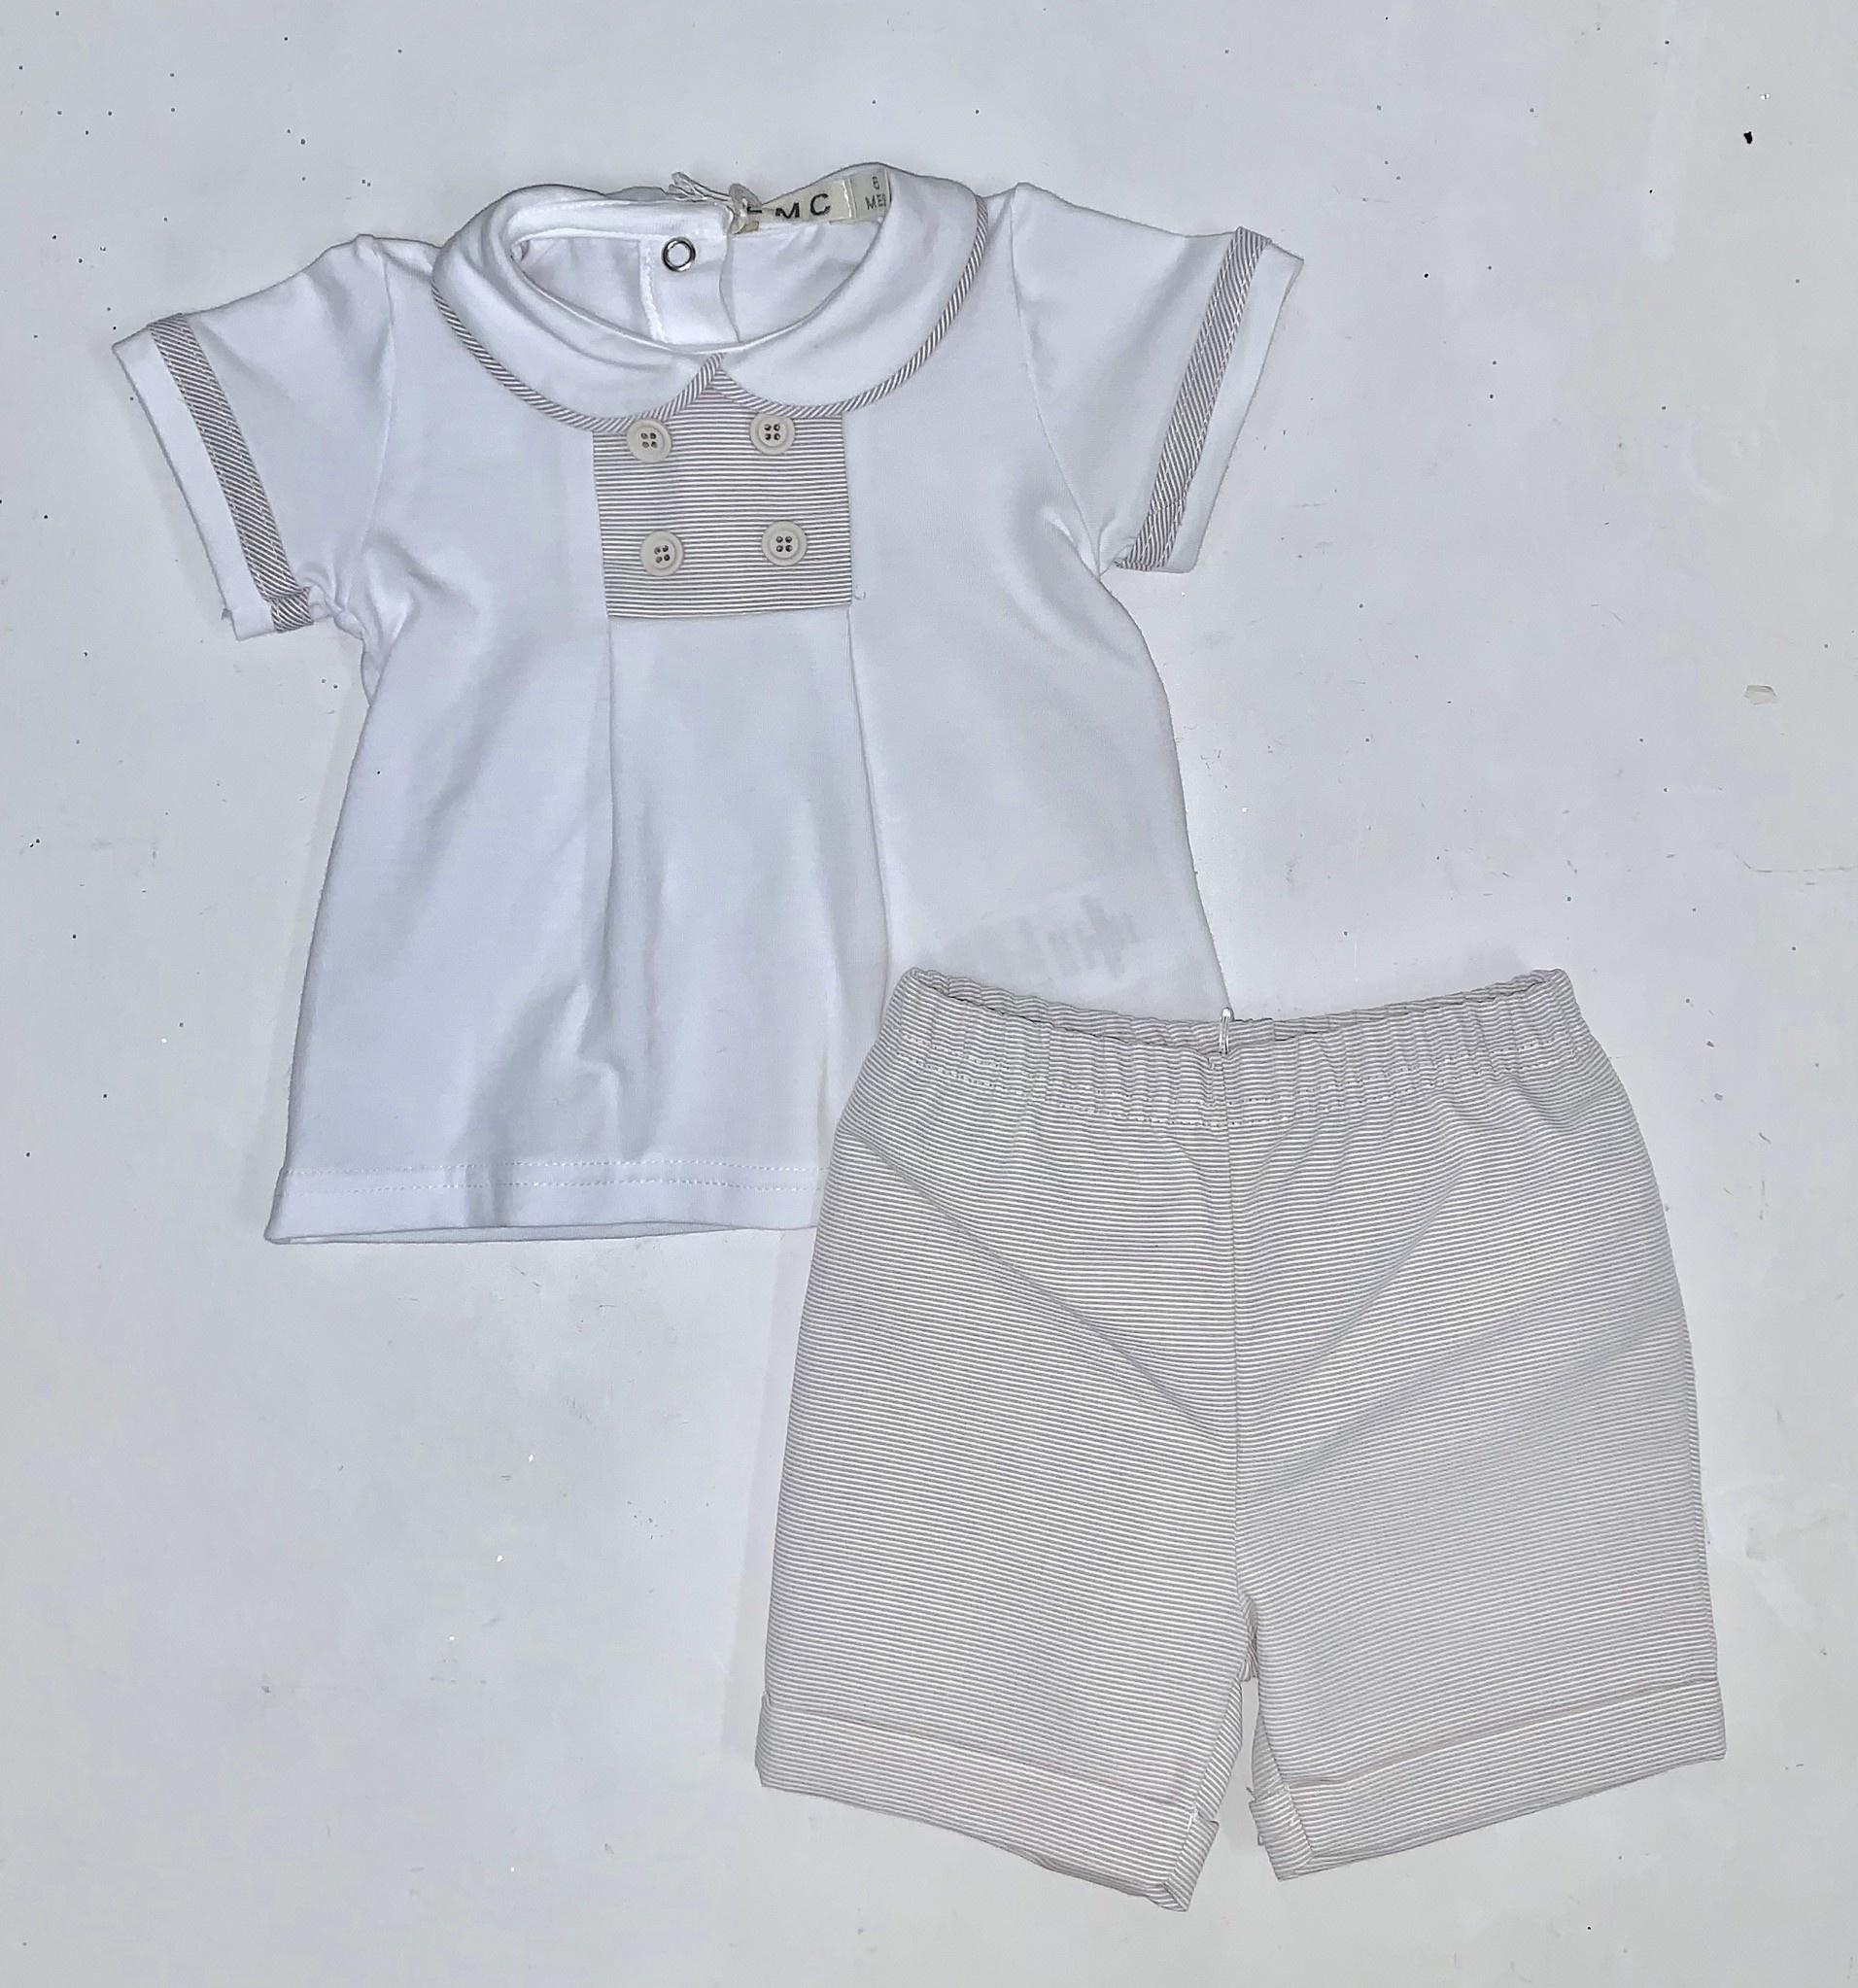 EMC EMC White Top, Button Detail & Fine Grey Stripe Shorts Set